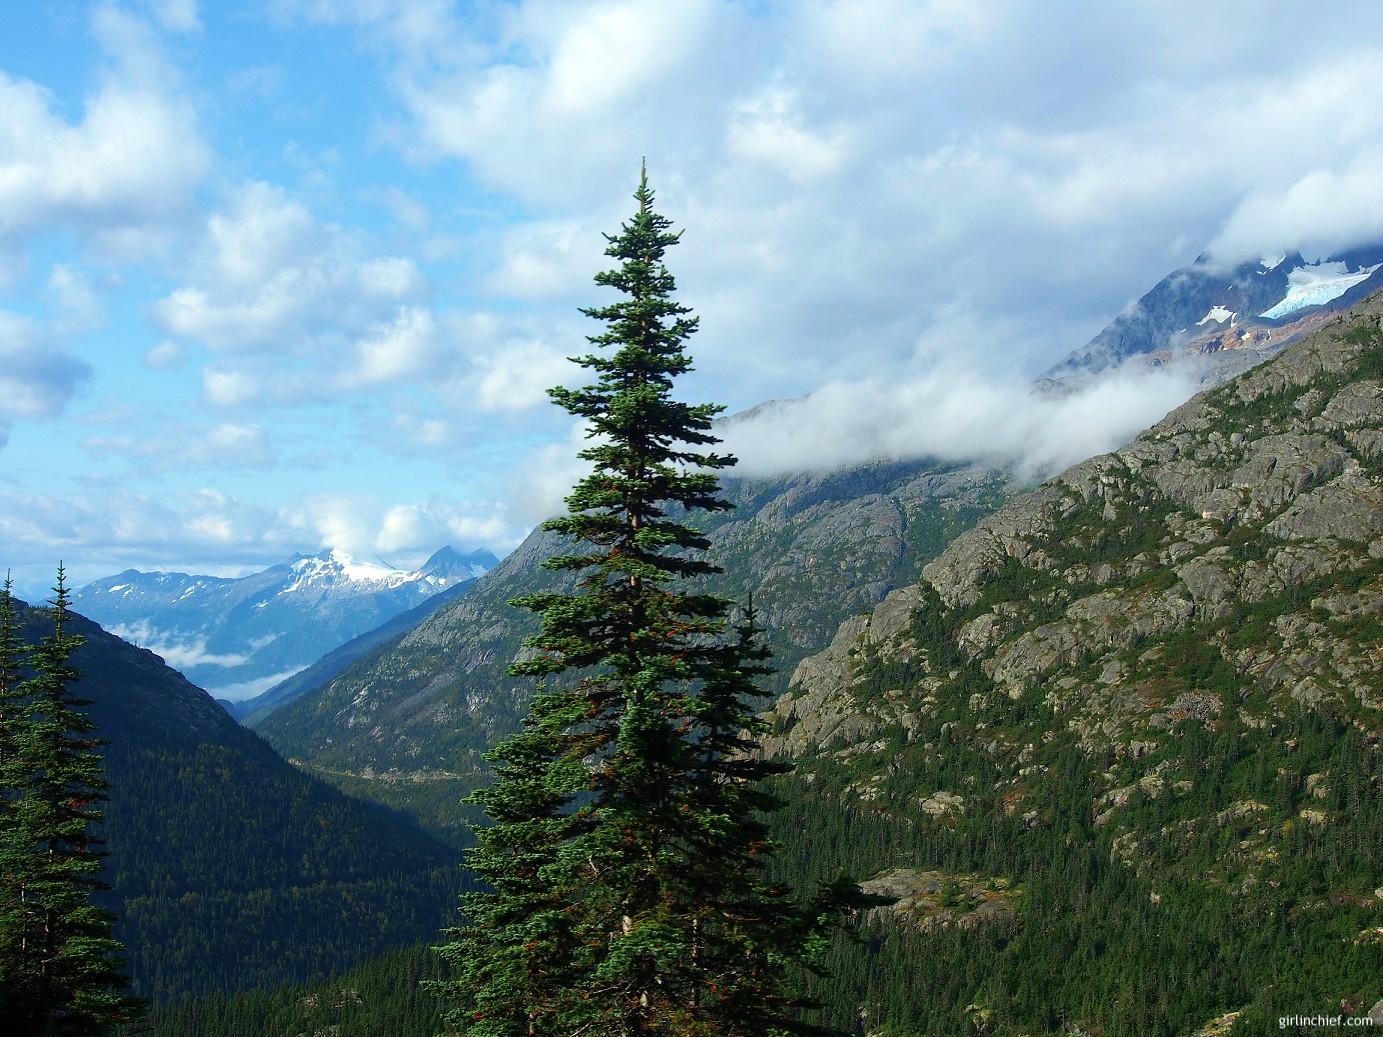 Alaska Cruise : Seeing Alaska's Beauty by Train on the White Pass & Yukon Rail